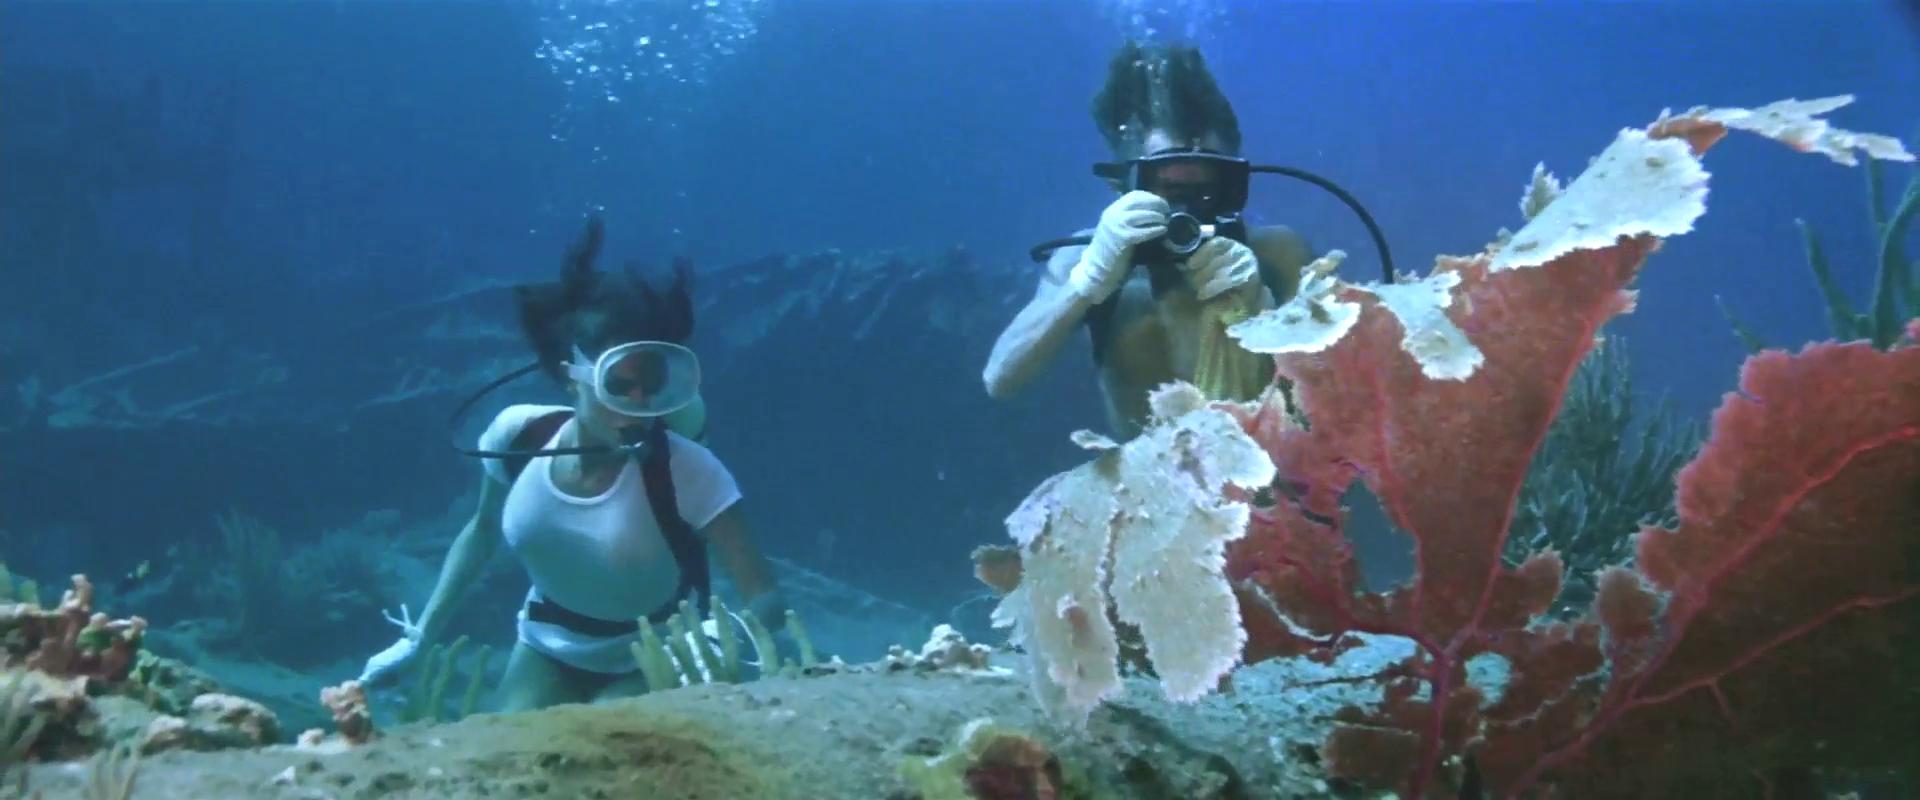 You Nude scuba diving movie